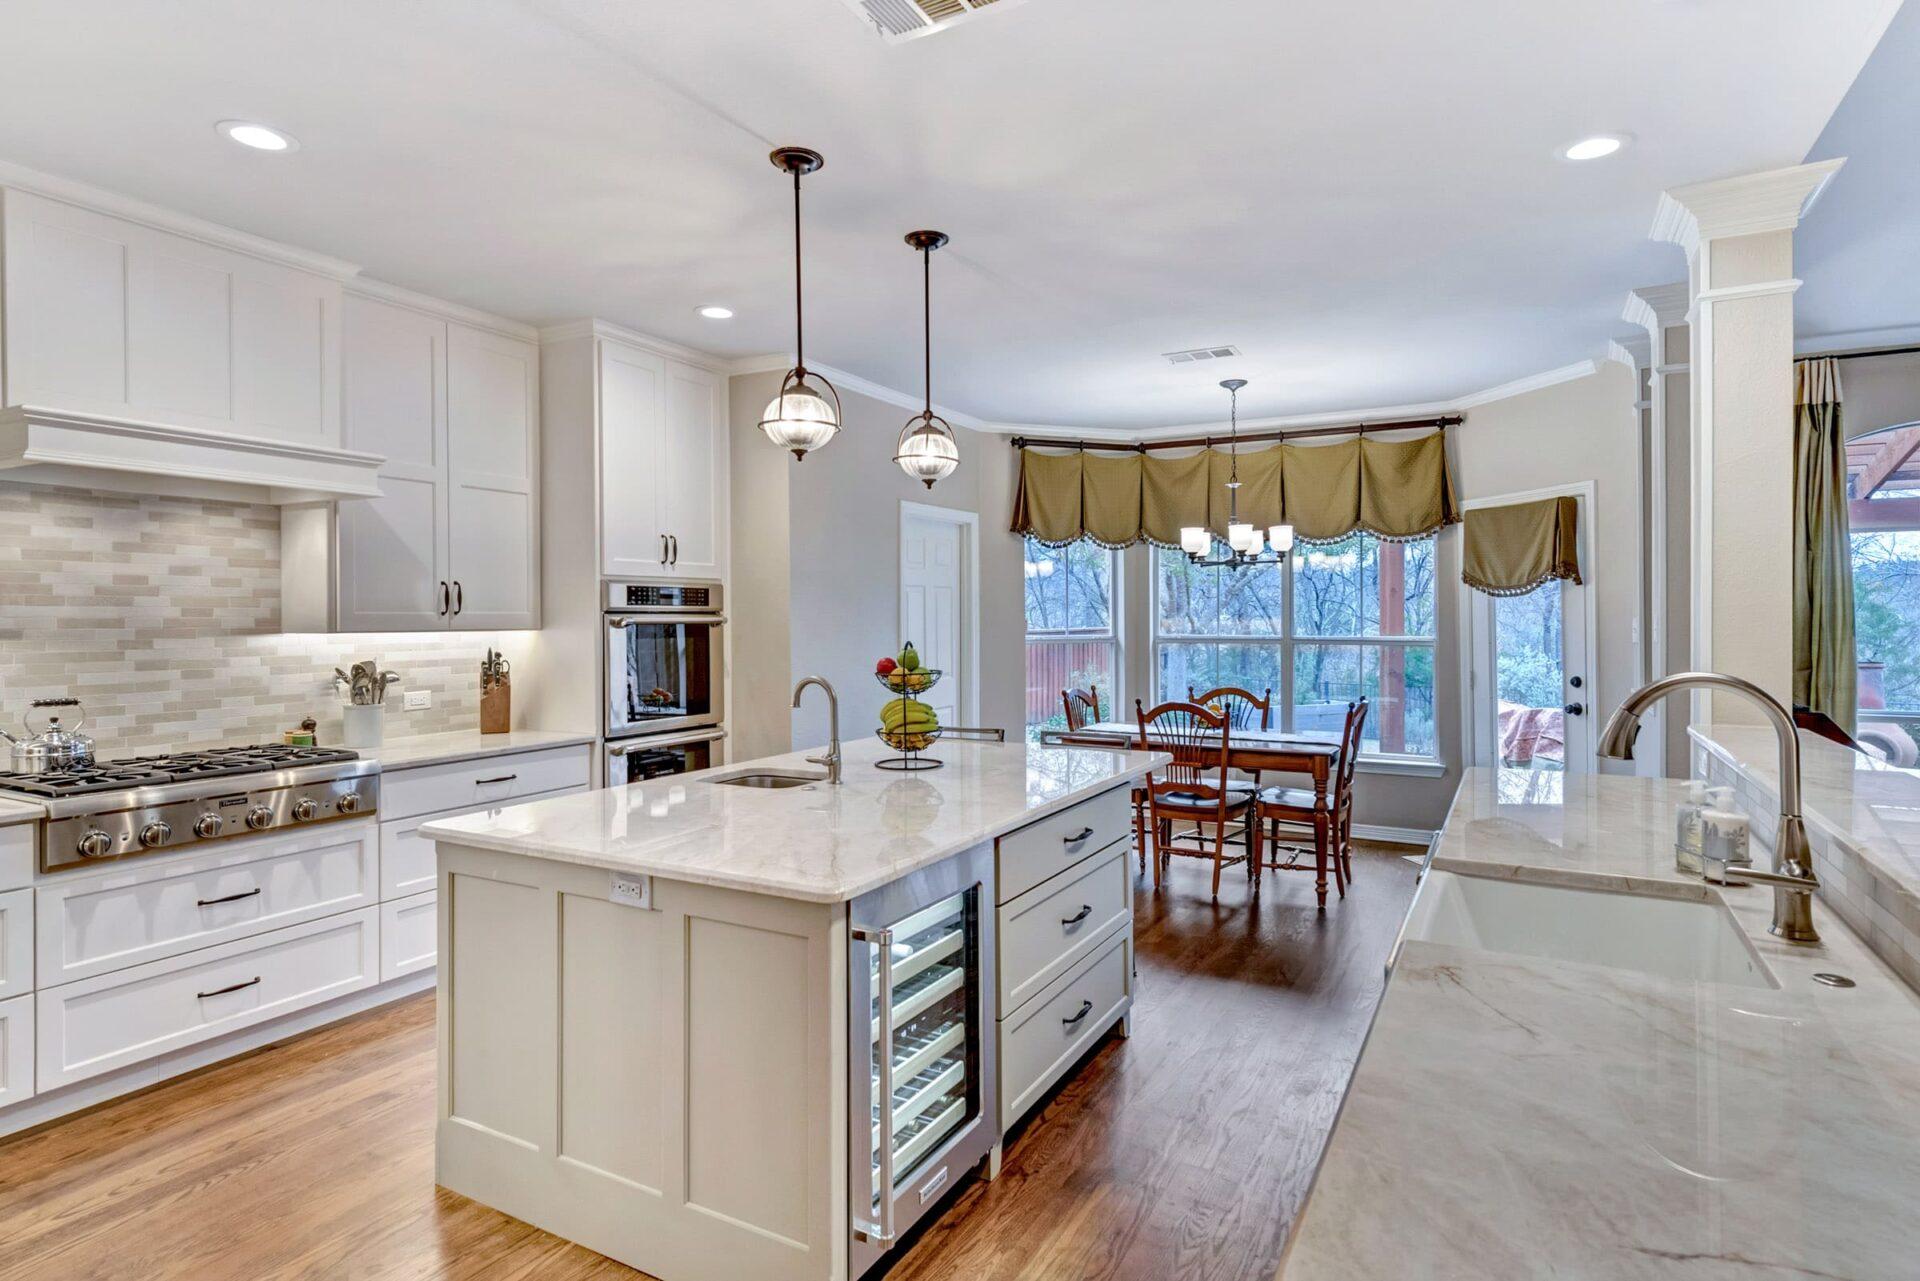 12 Factors that Affect Kitchen Remodel Costs